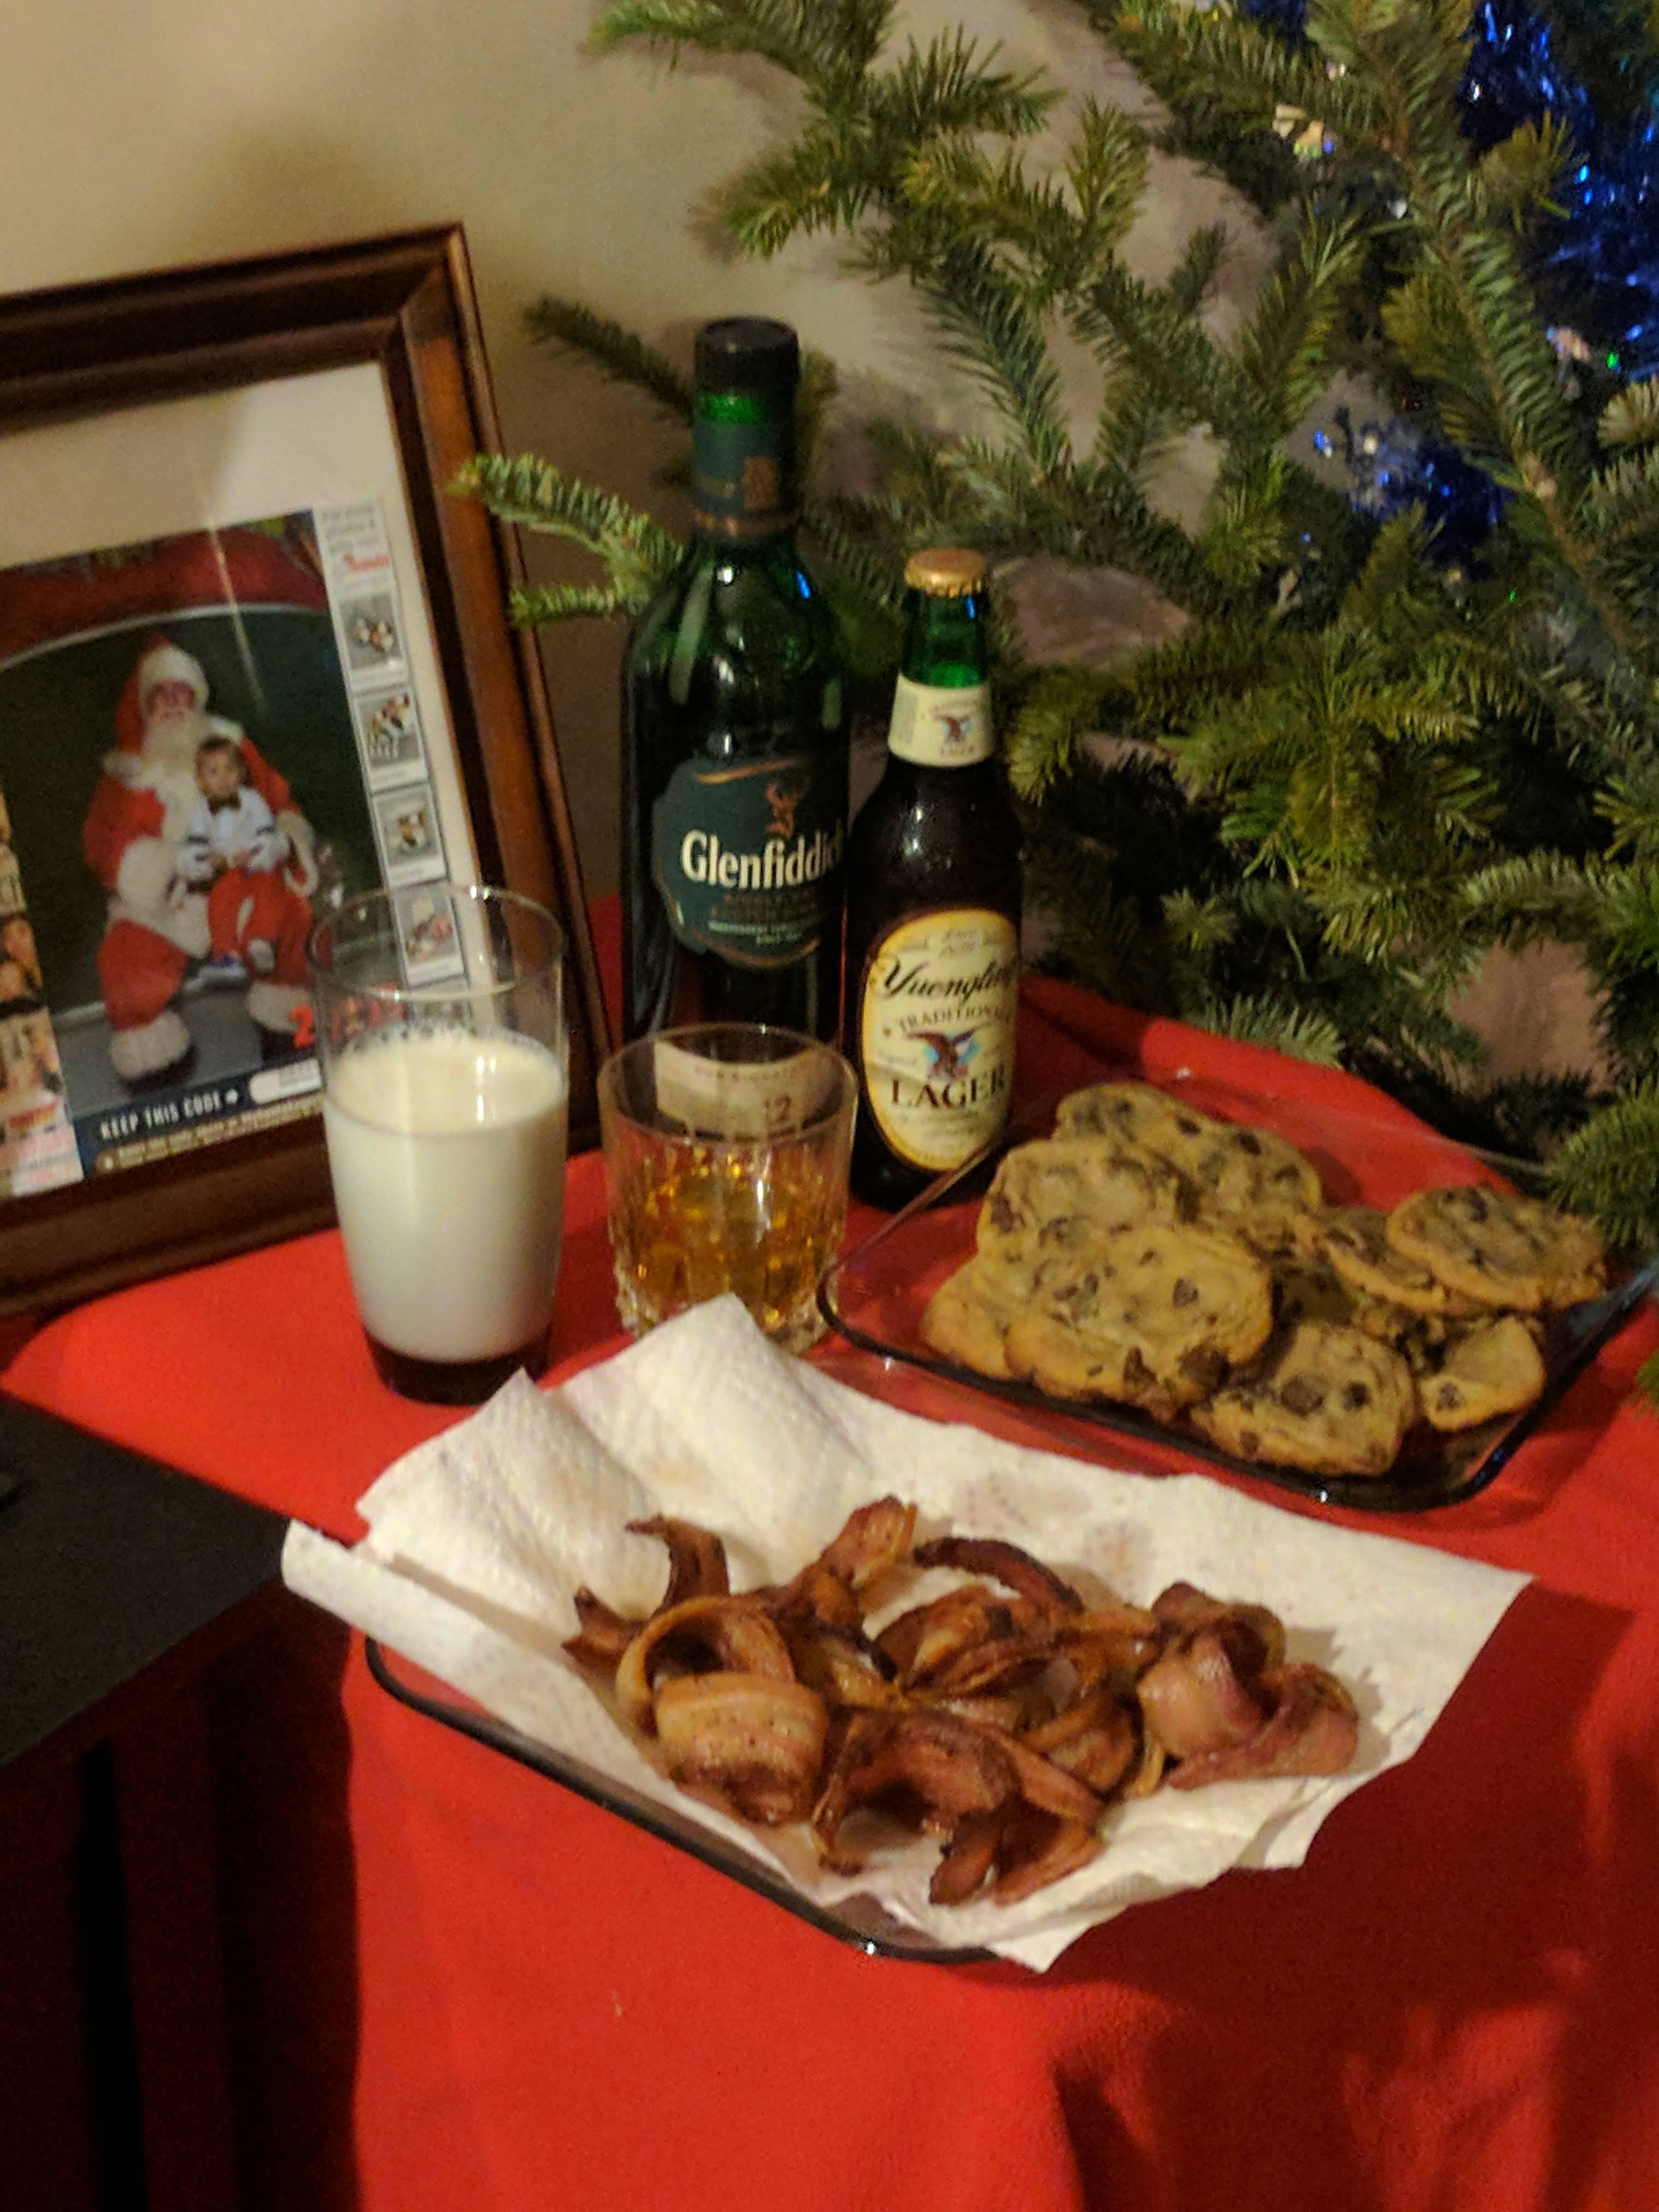 Santa's got options this year